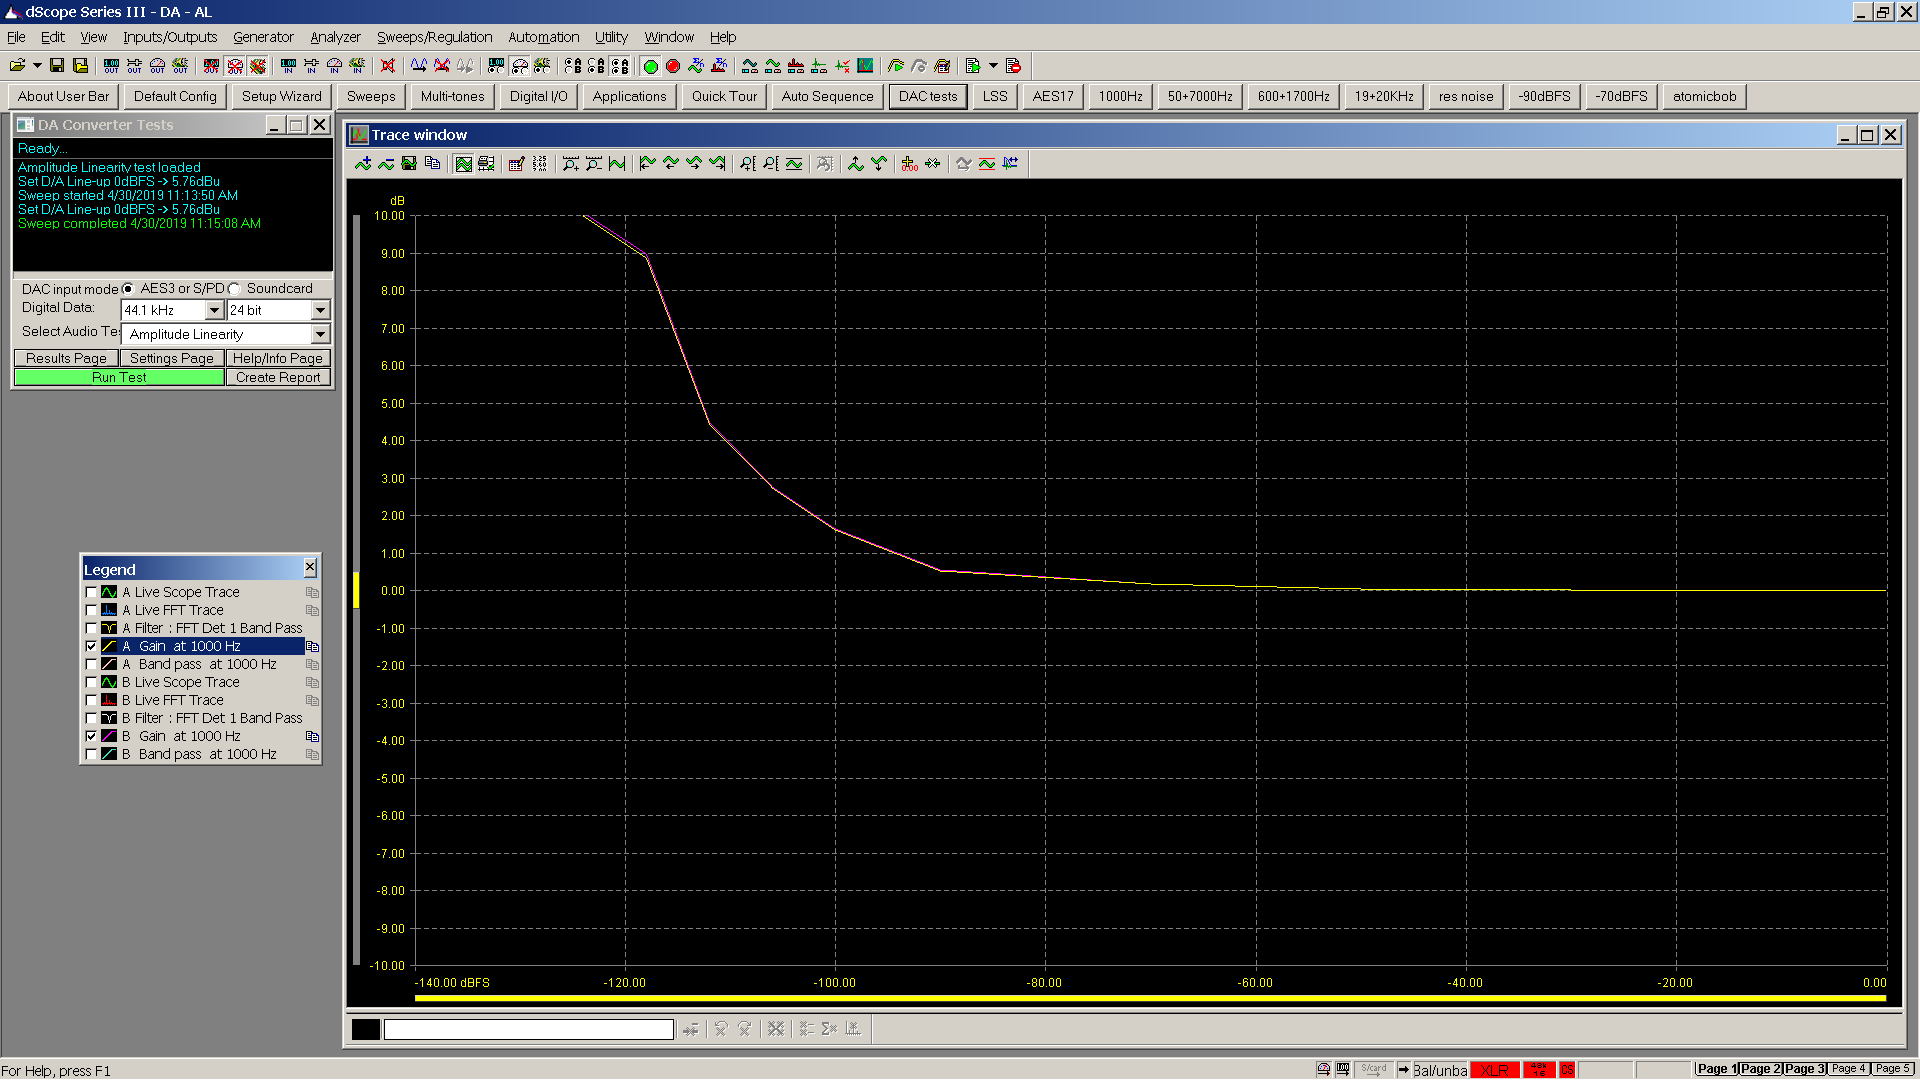 20190429-11 MOS24 SE 1 KHz gain linearity - Opt 44K.PNG